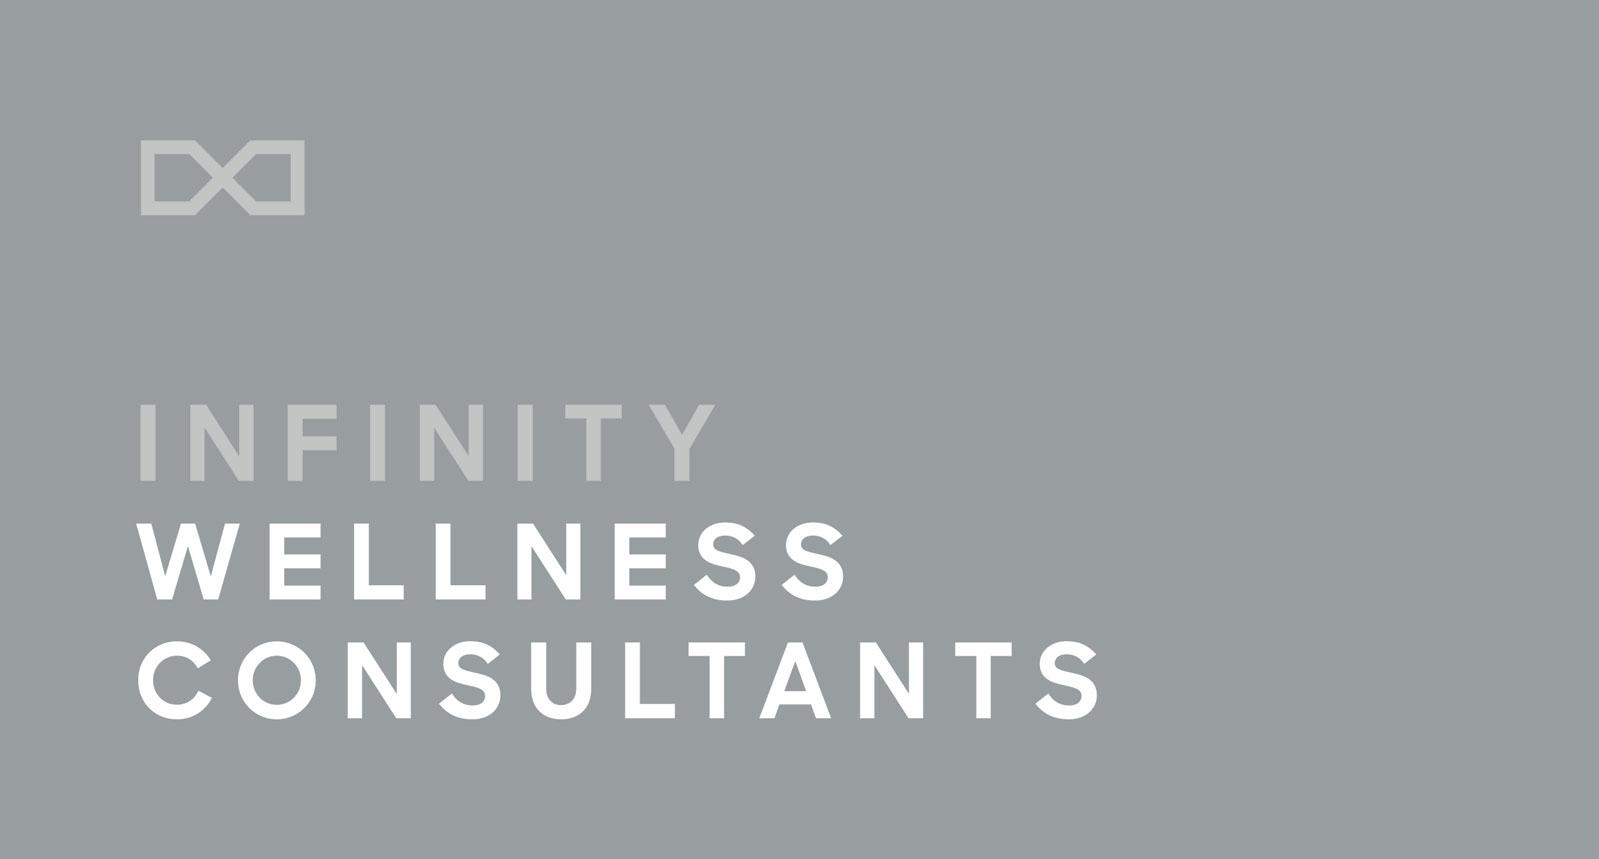 INFINITY_WELLNESS_CONSULTANTS_LOGO.jpg